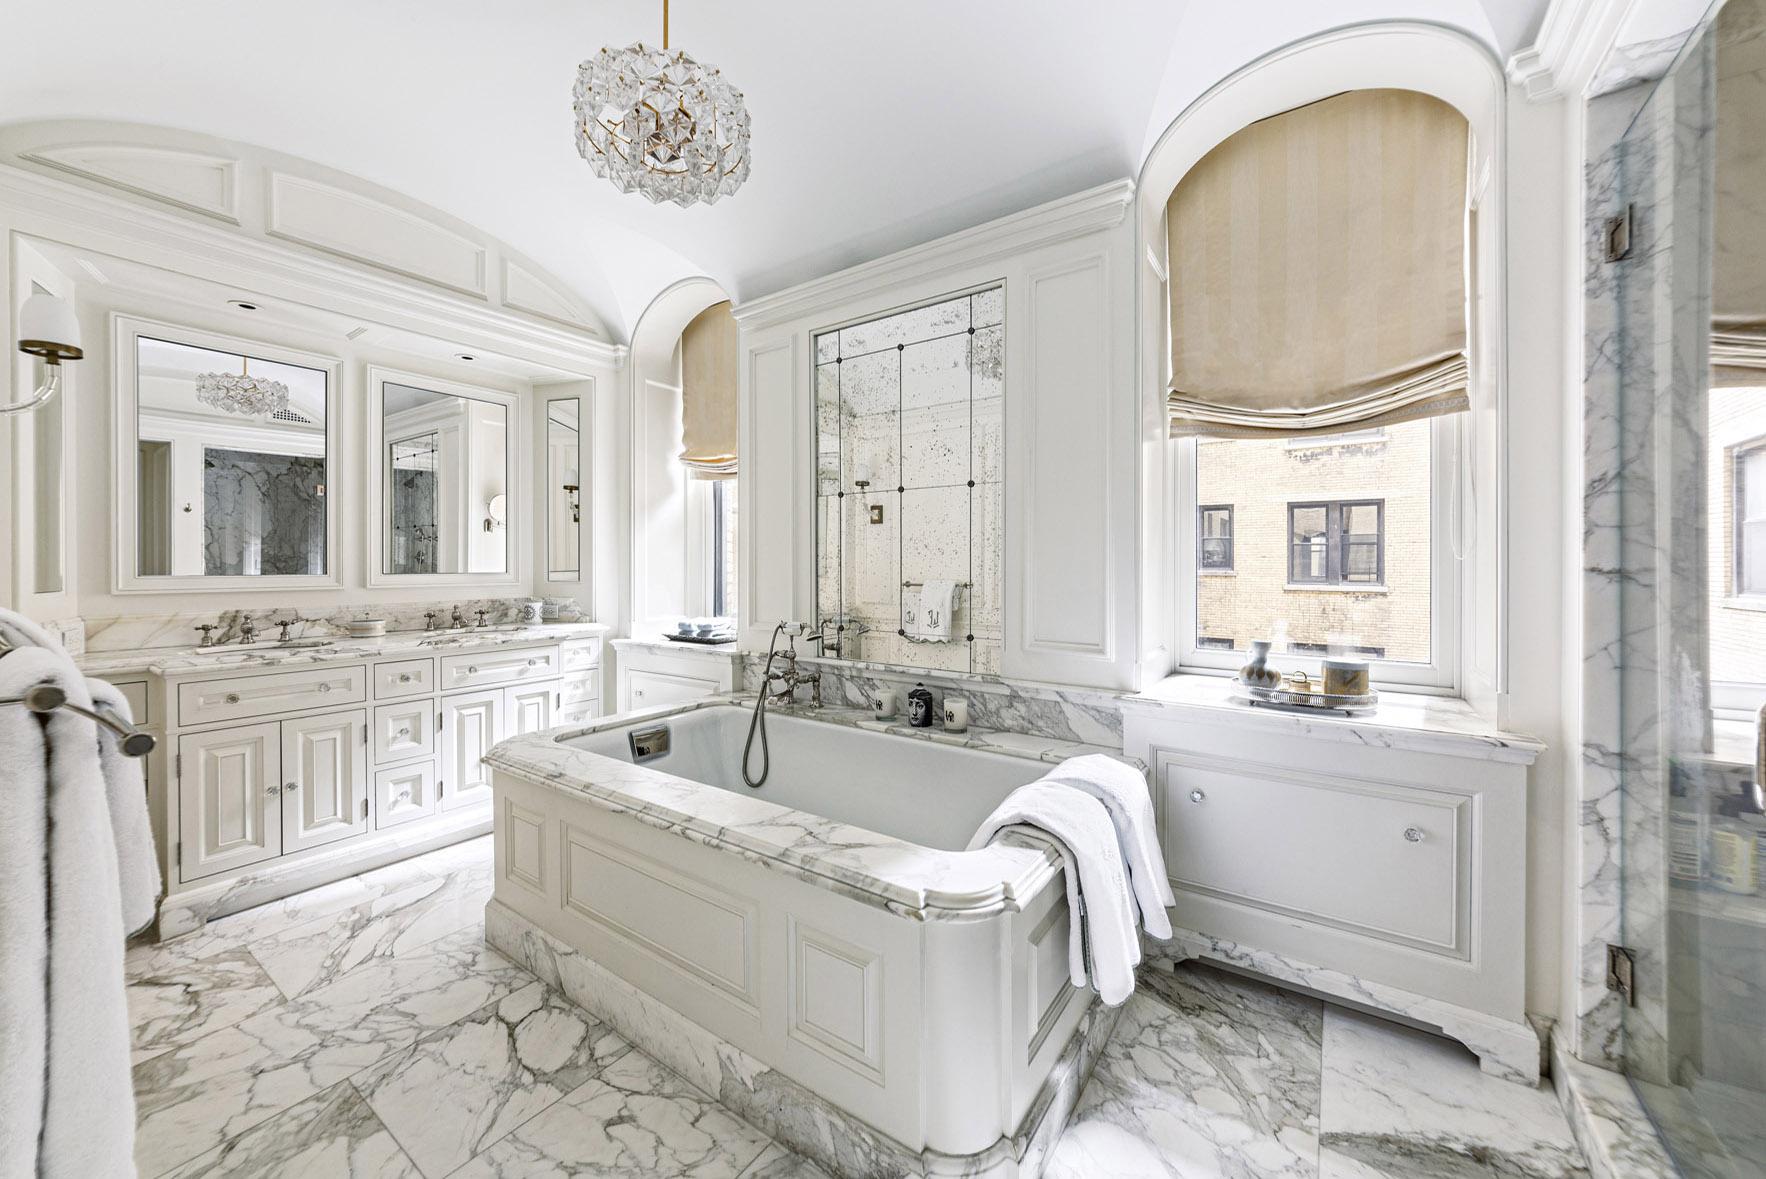 luxurious marble bathroom inside 255 West 84th Street, Apt 2AE in new york city